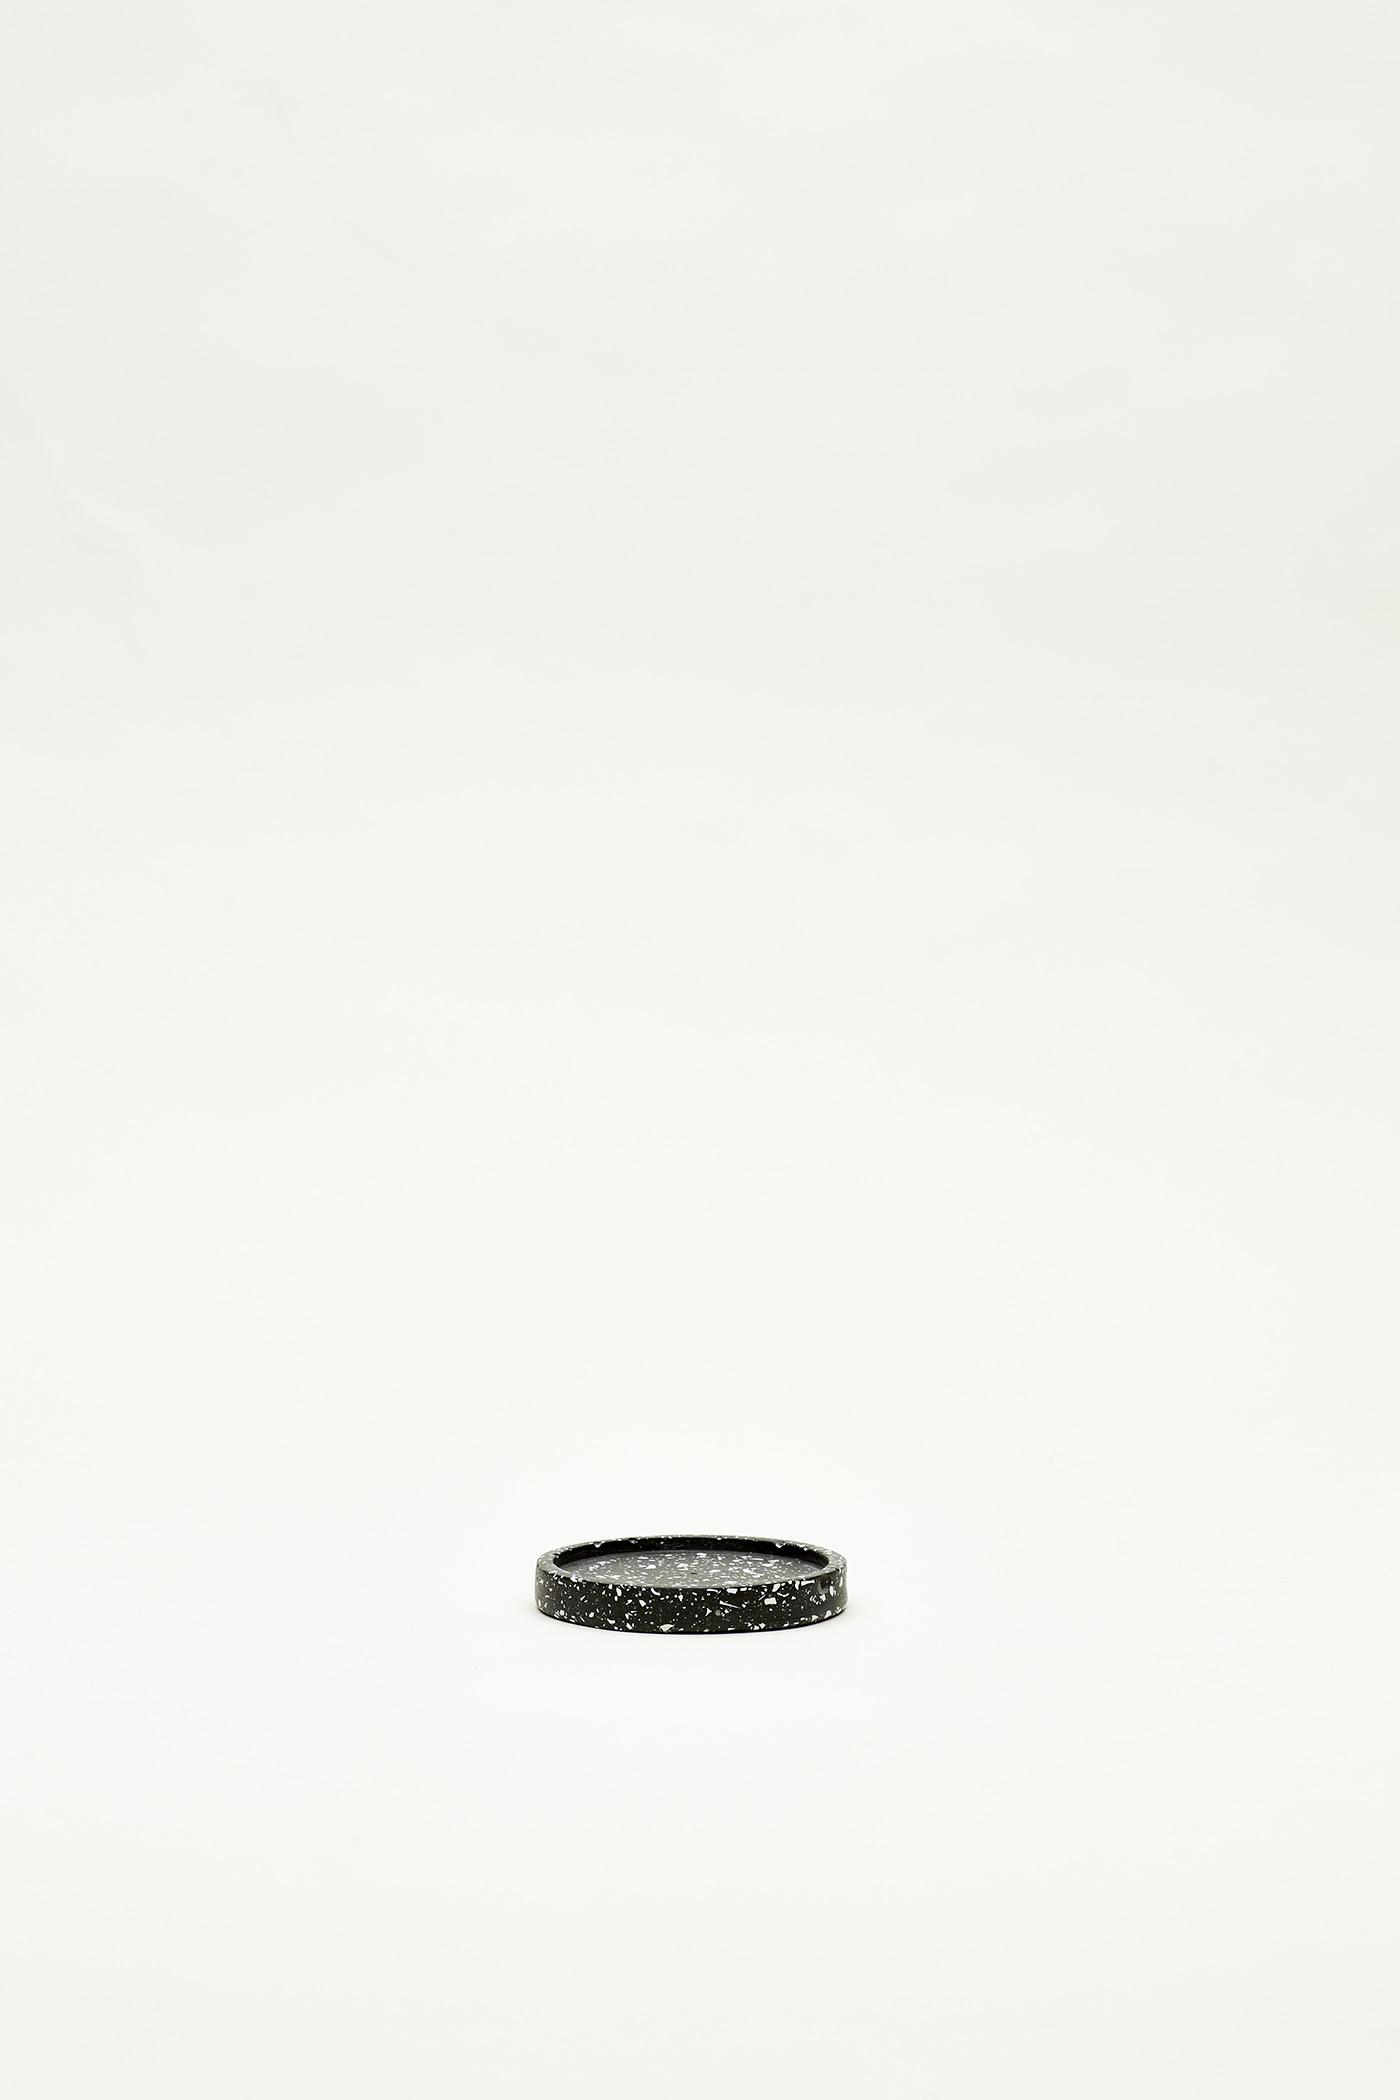 Chokmah Terrazzo-style Mini